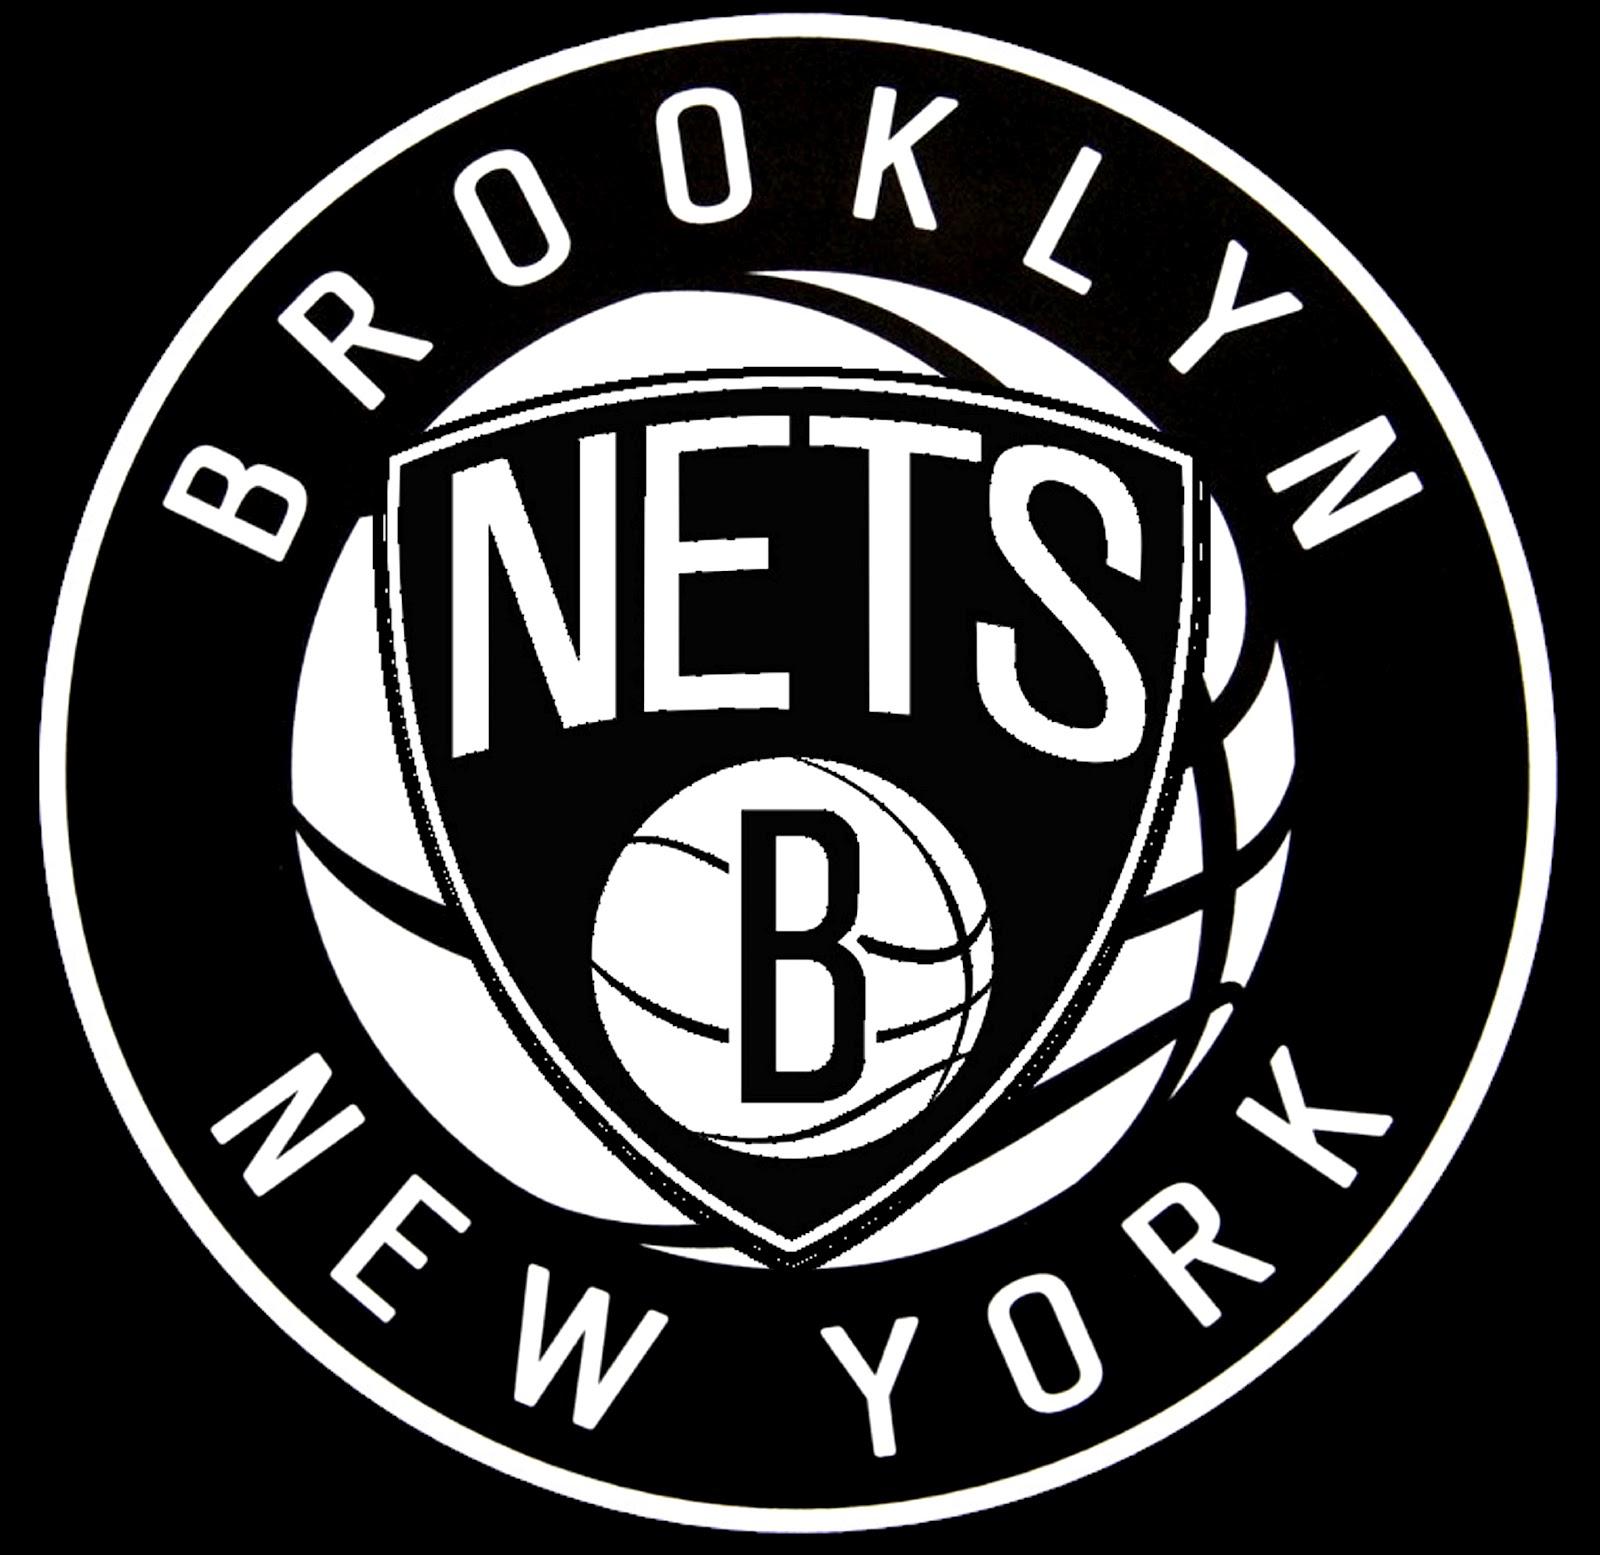 My GraphiCKs: Brooklyn Nets